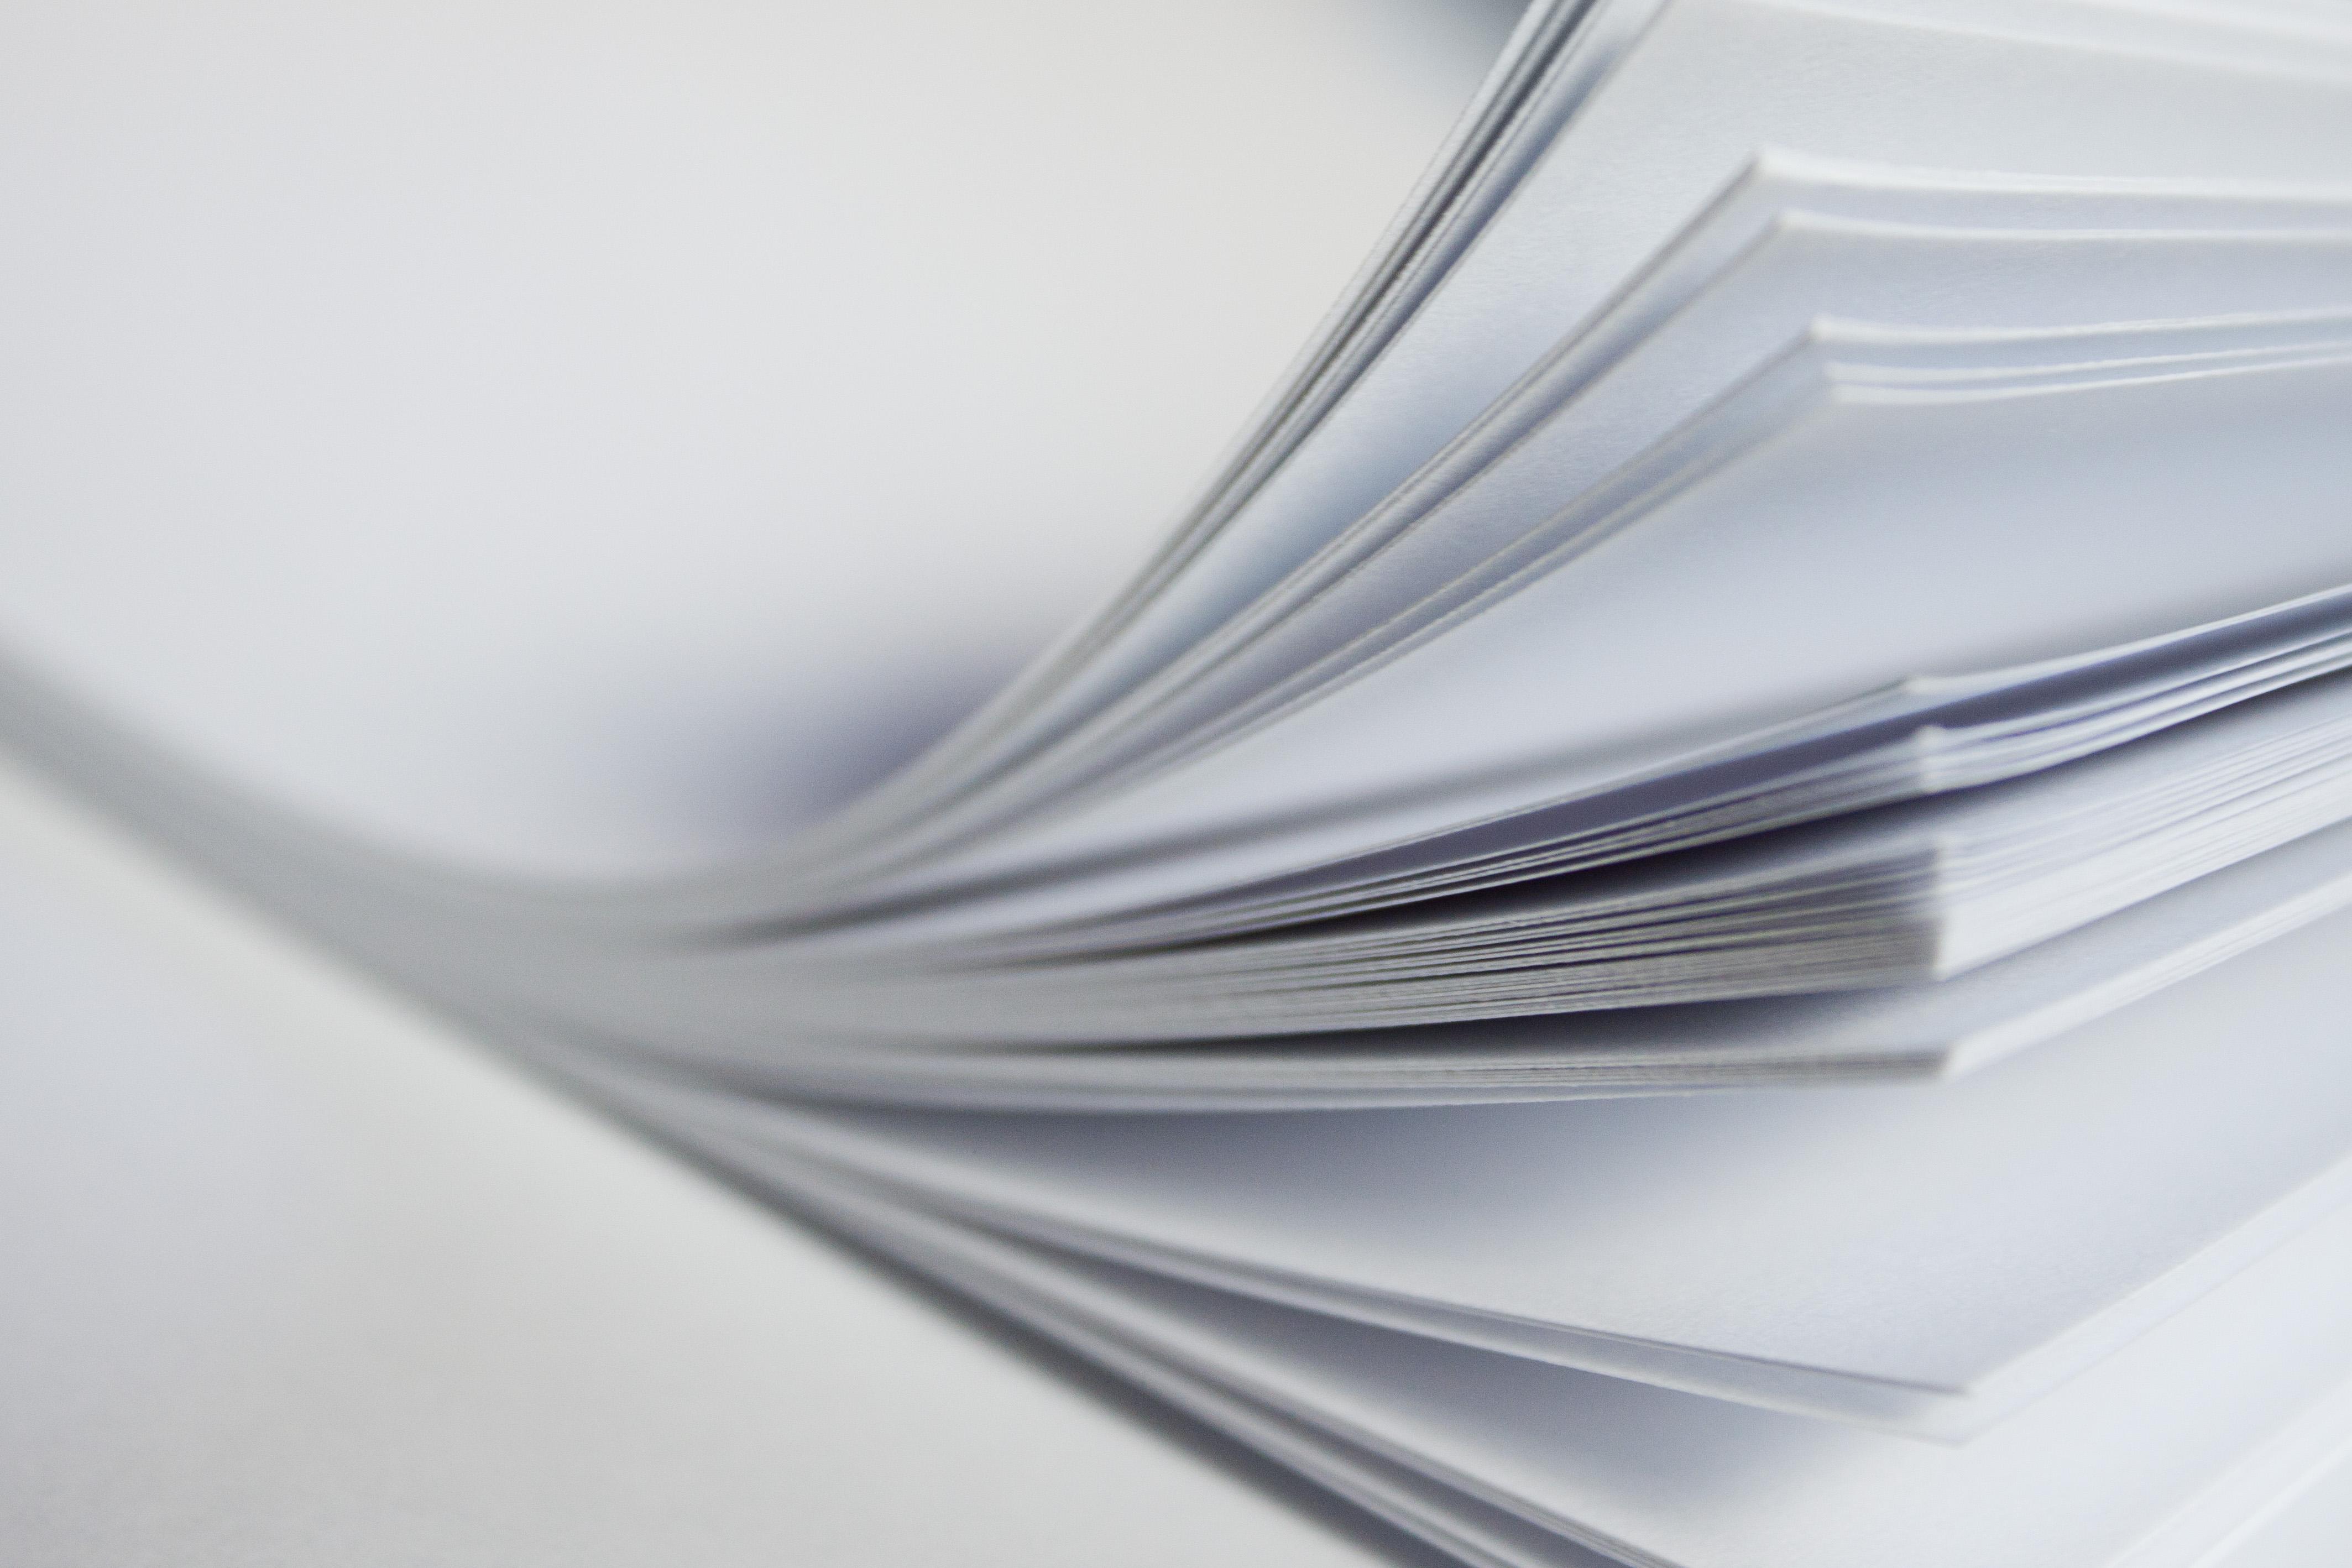 papiers crig-imprimerie caen